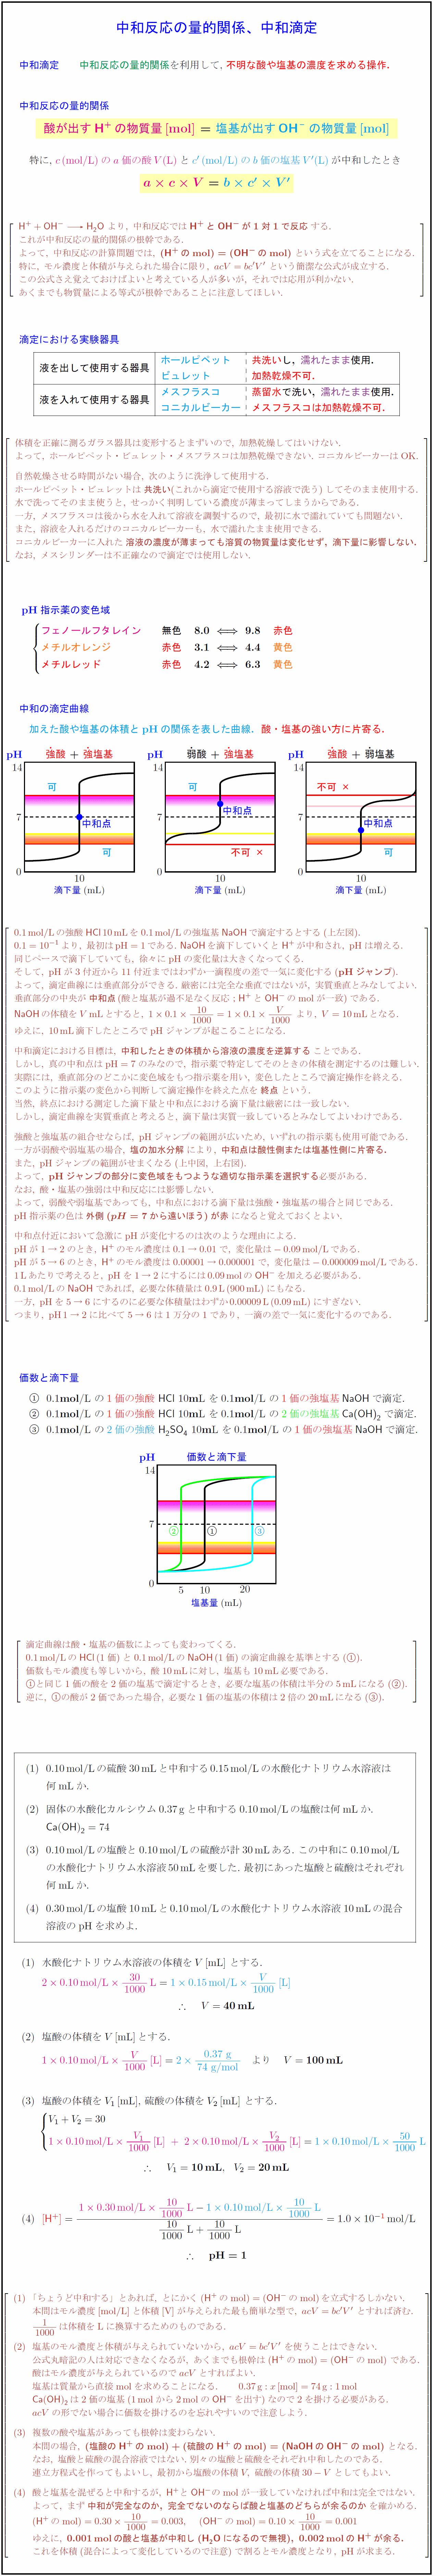 neutralization-titration